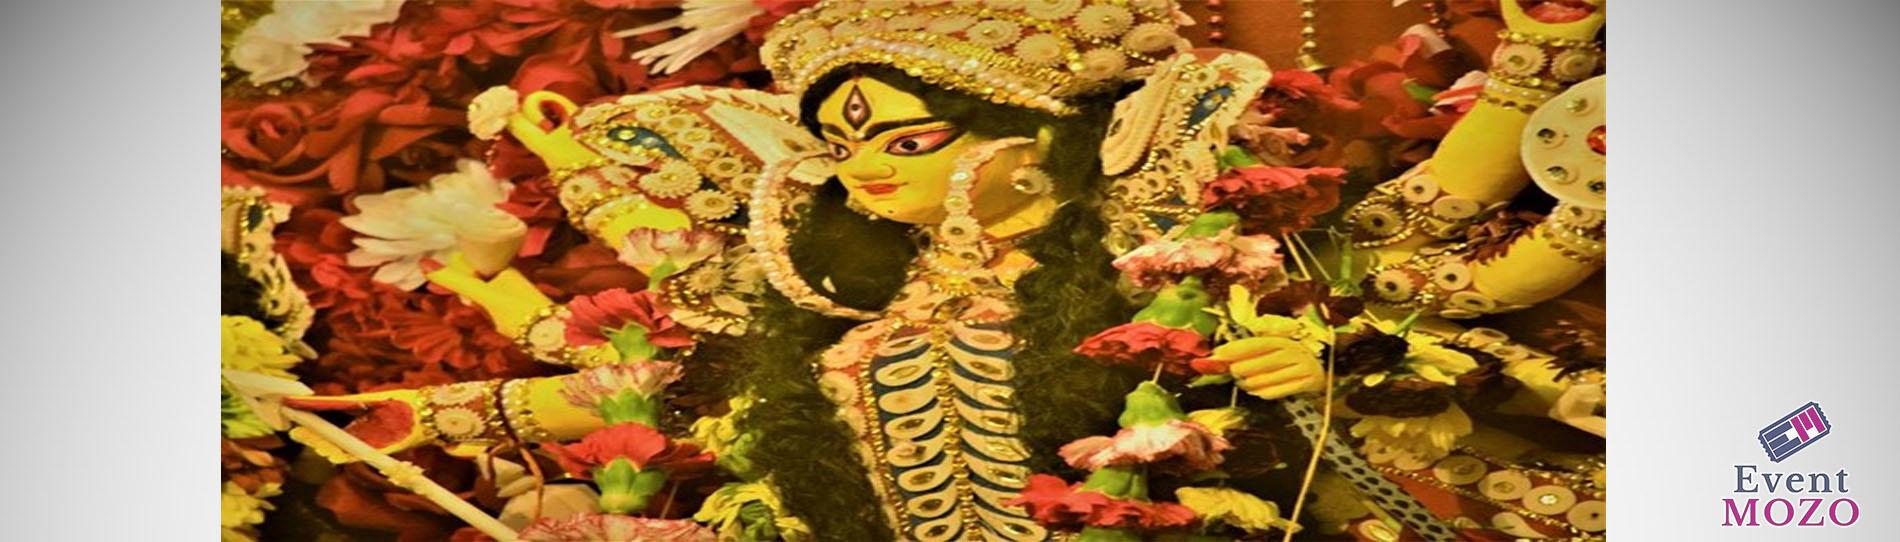 EventMozo Durga Puja in Fremont With New Protima From Kumartuli!